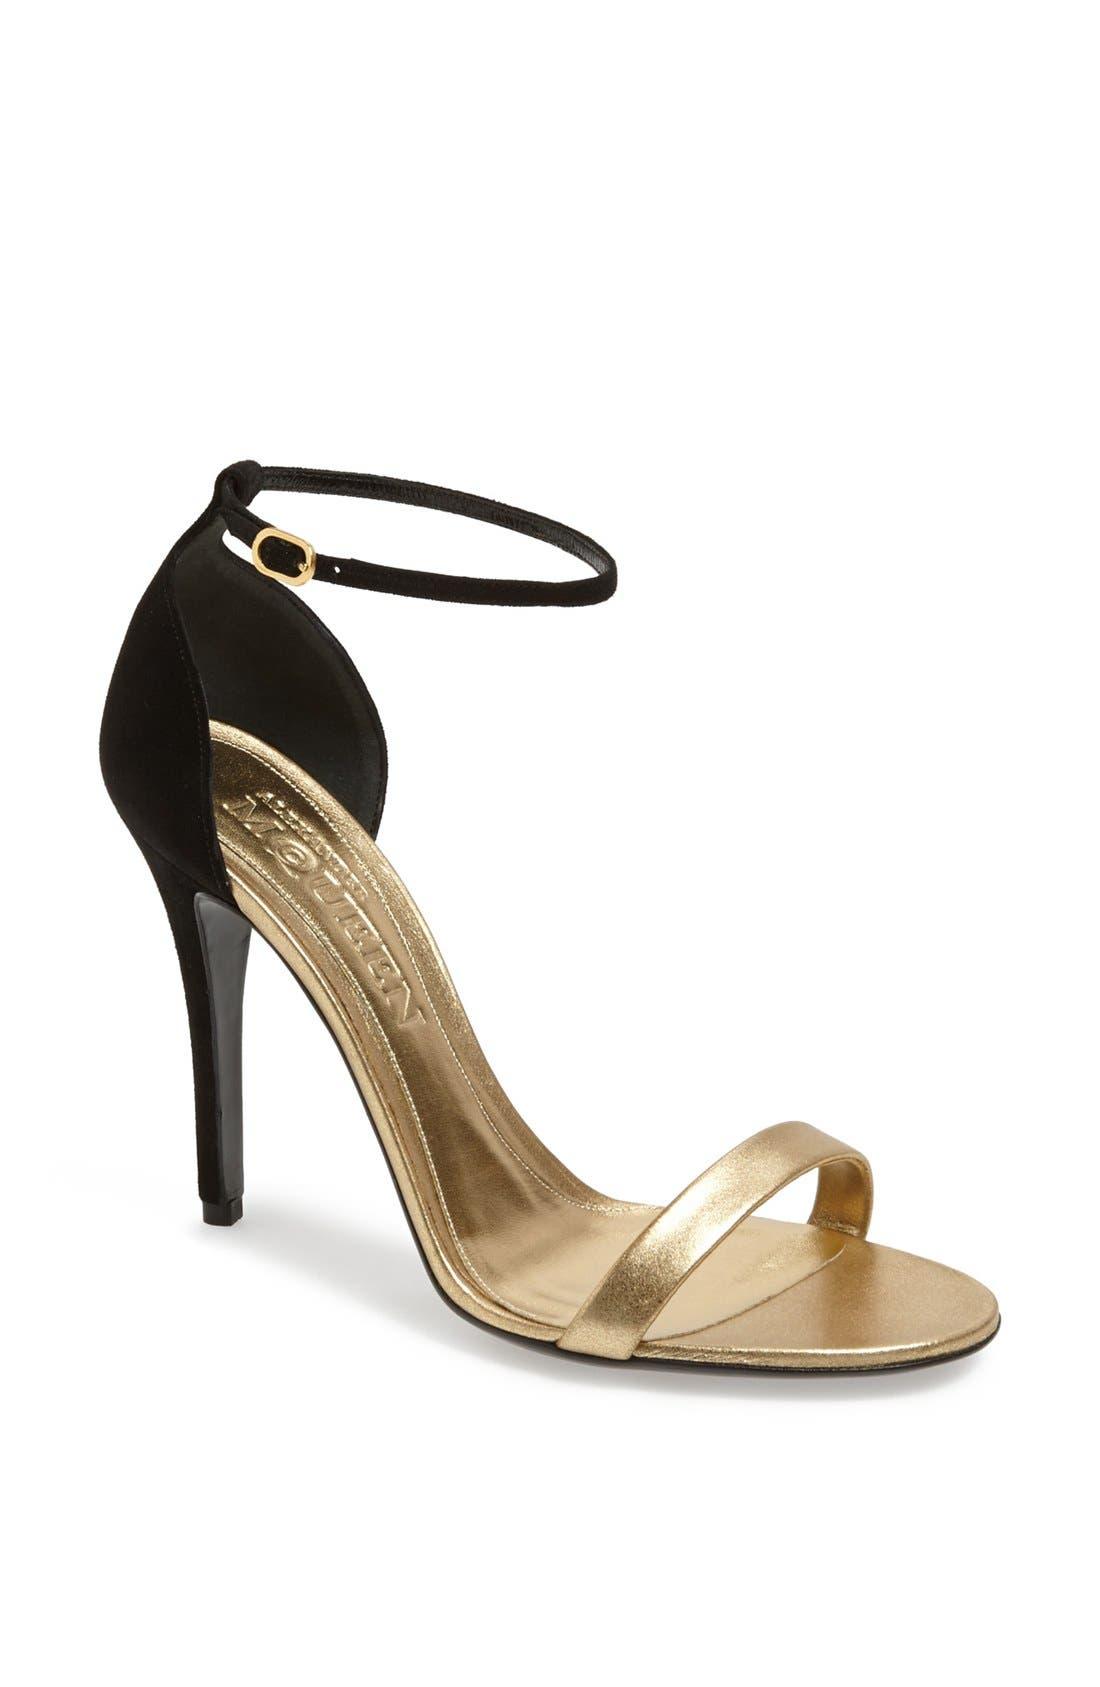 Alternate Image 1 Selected - Alexander McQueen 'Minimalist' Sandal